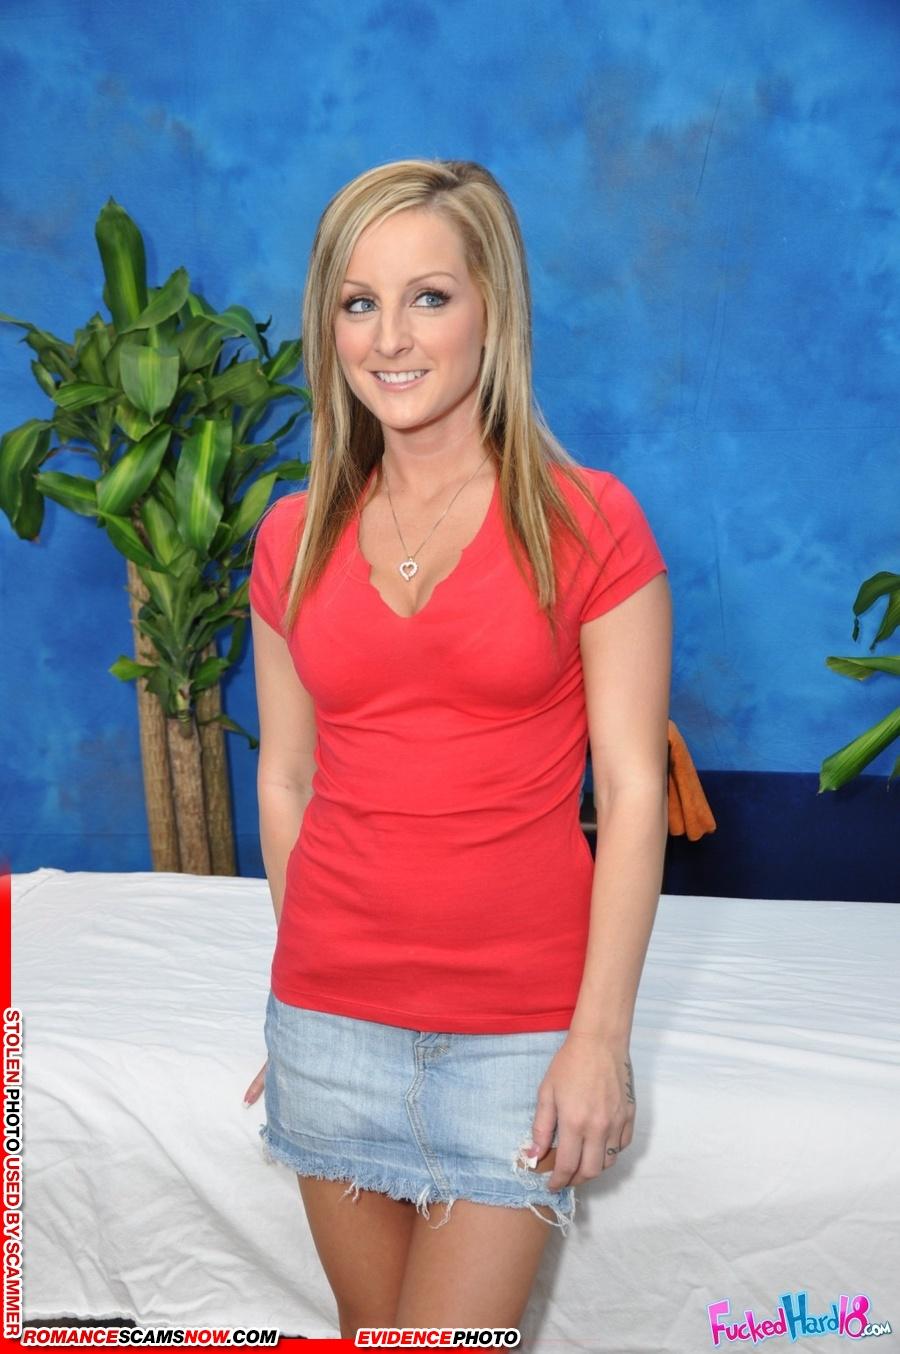 Melissa Matthews Xoxo  Have You Seen Her - Stolen Face  Stolen Identity - Scars -3261